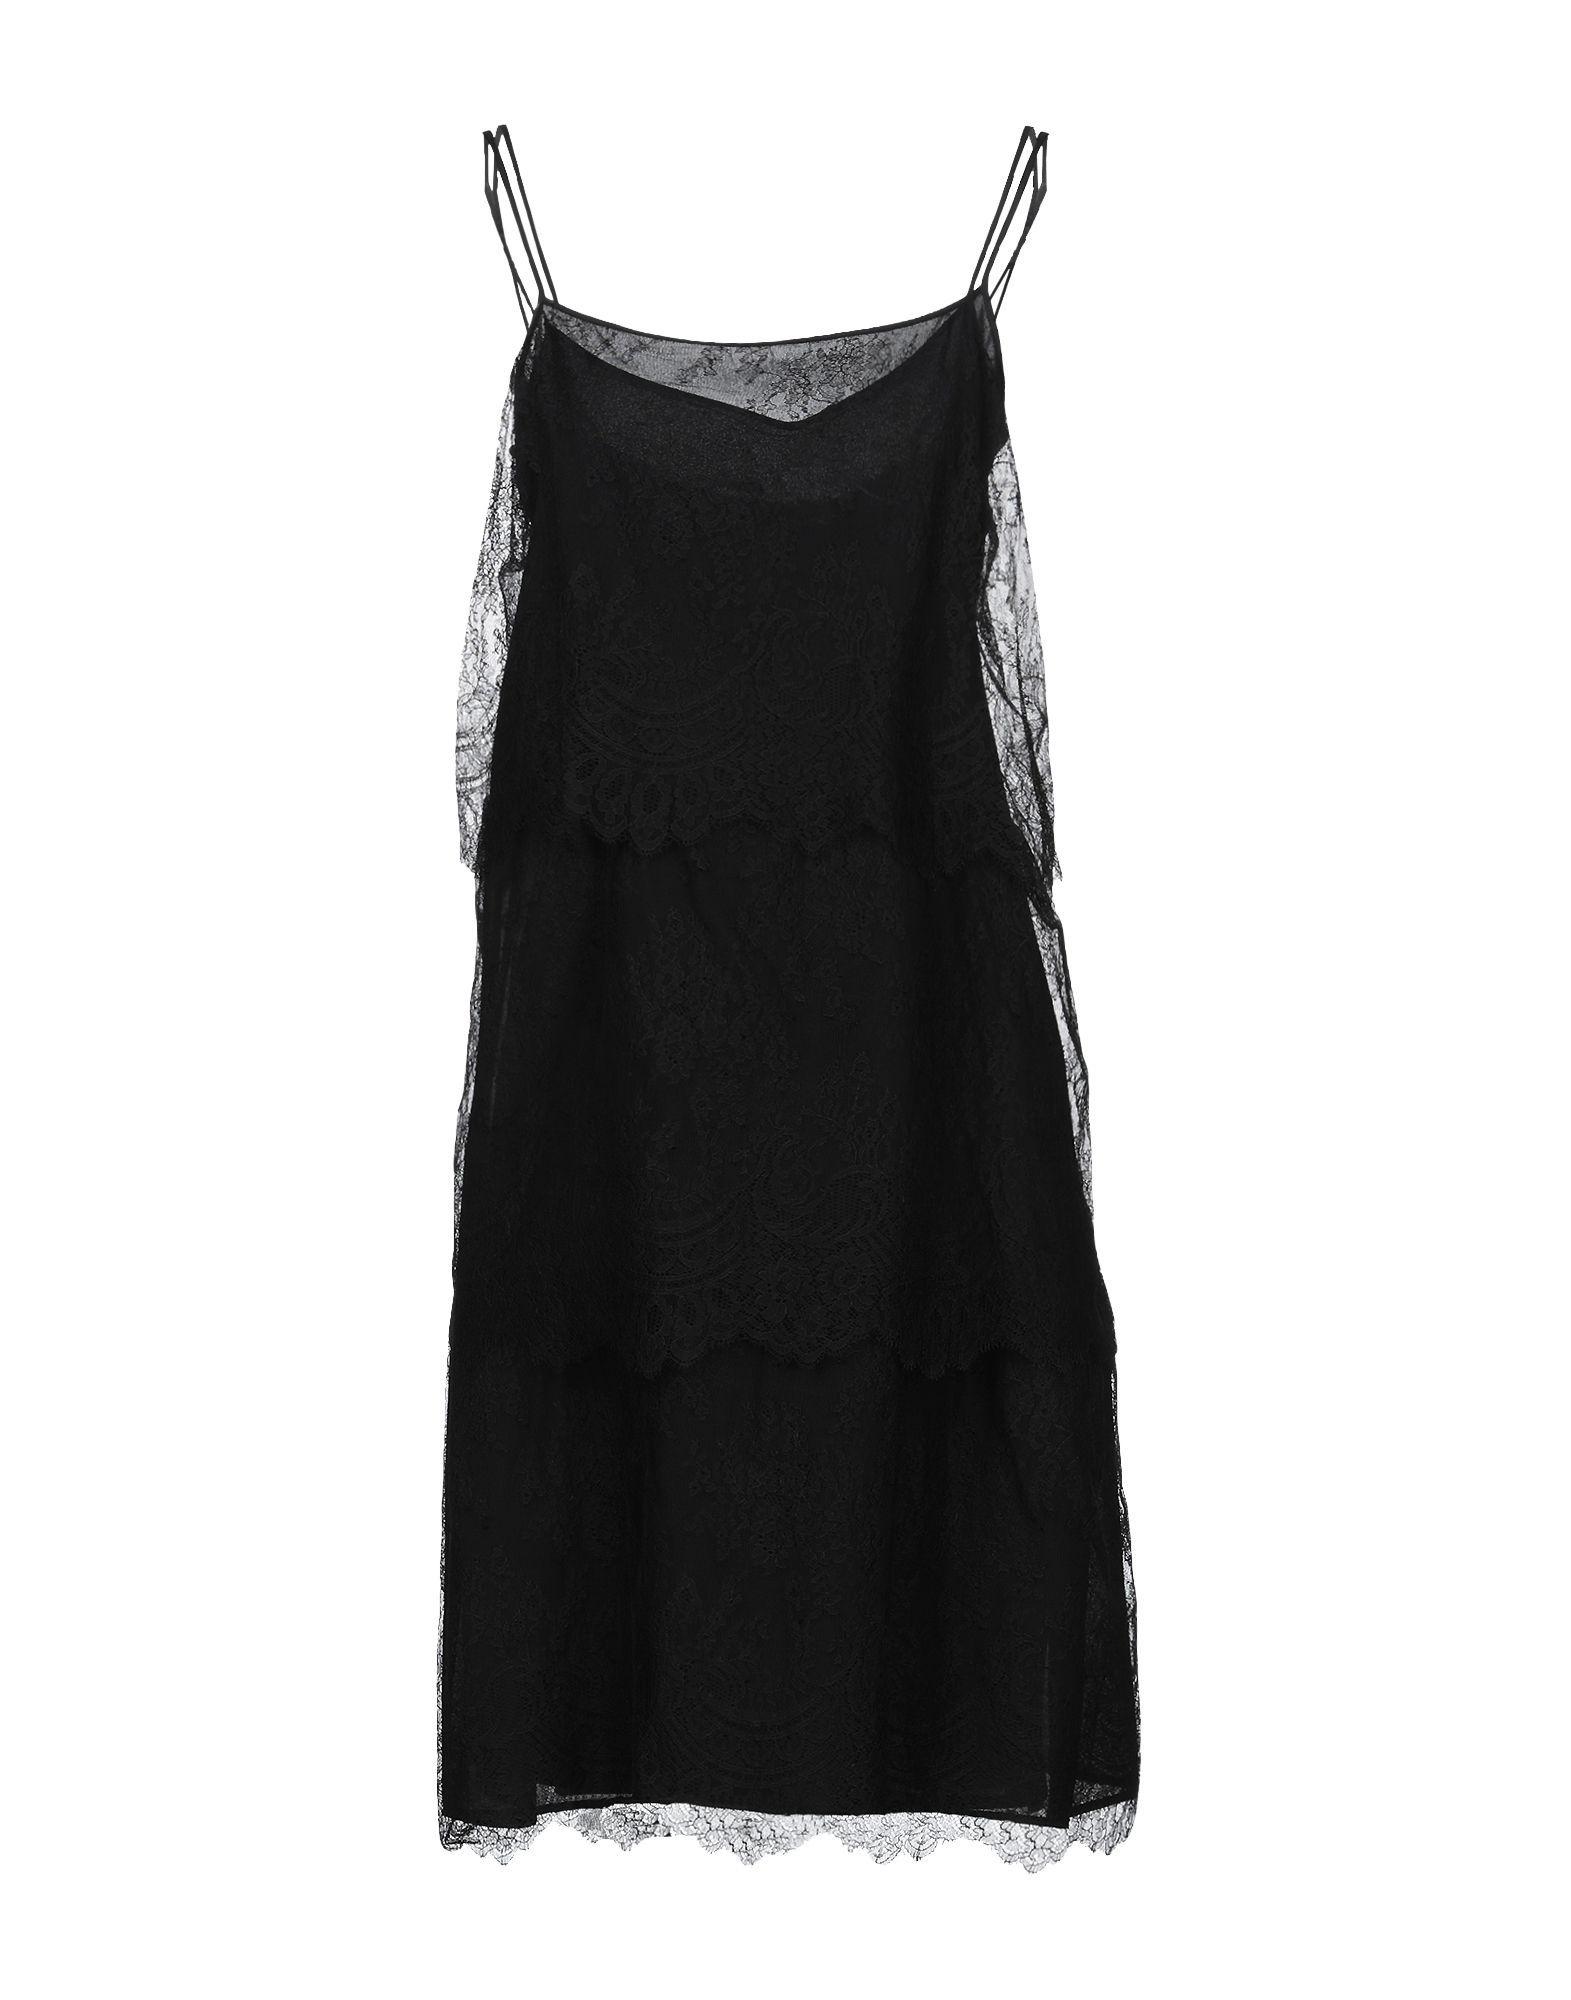 DRESSES Woman Alessandro Dell'Acqua Black Polyamid